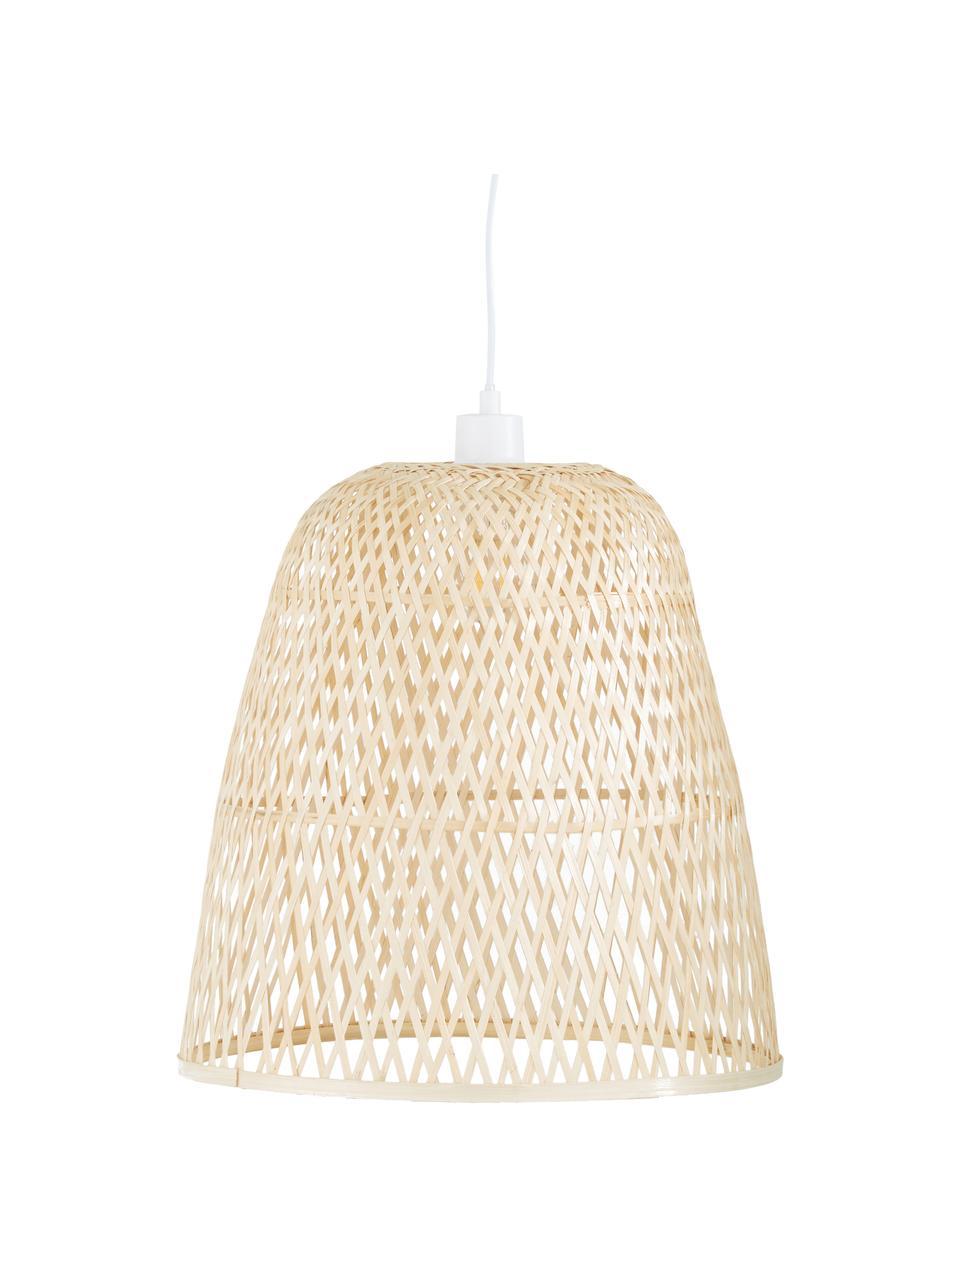 Handgefertigte Pendelleuchte Eve aus Bambus, Lampenschirm: Bambus, Baldachin: Metall, pulverbeschichtet, Bambus, Ø 40 x H 40 cm